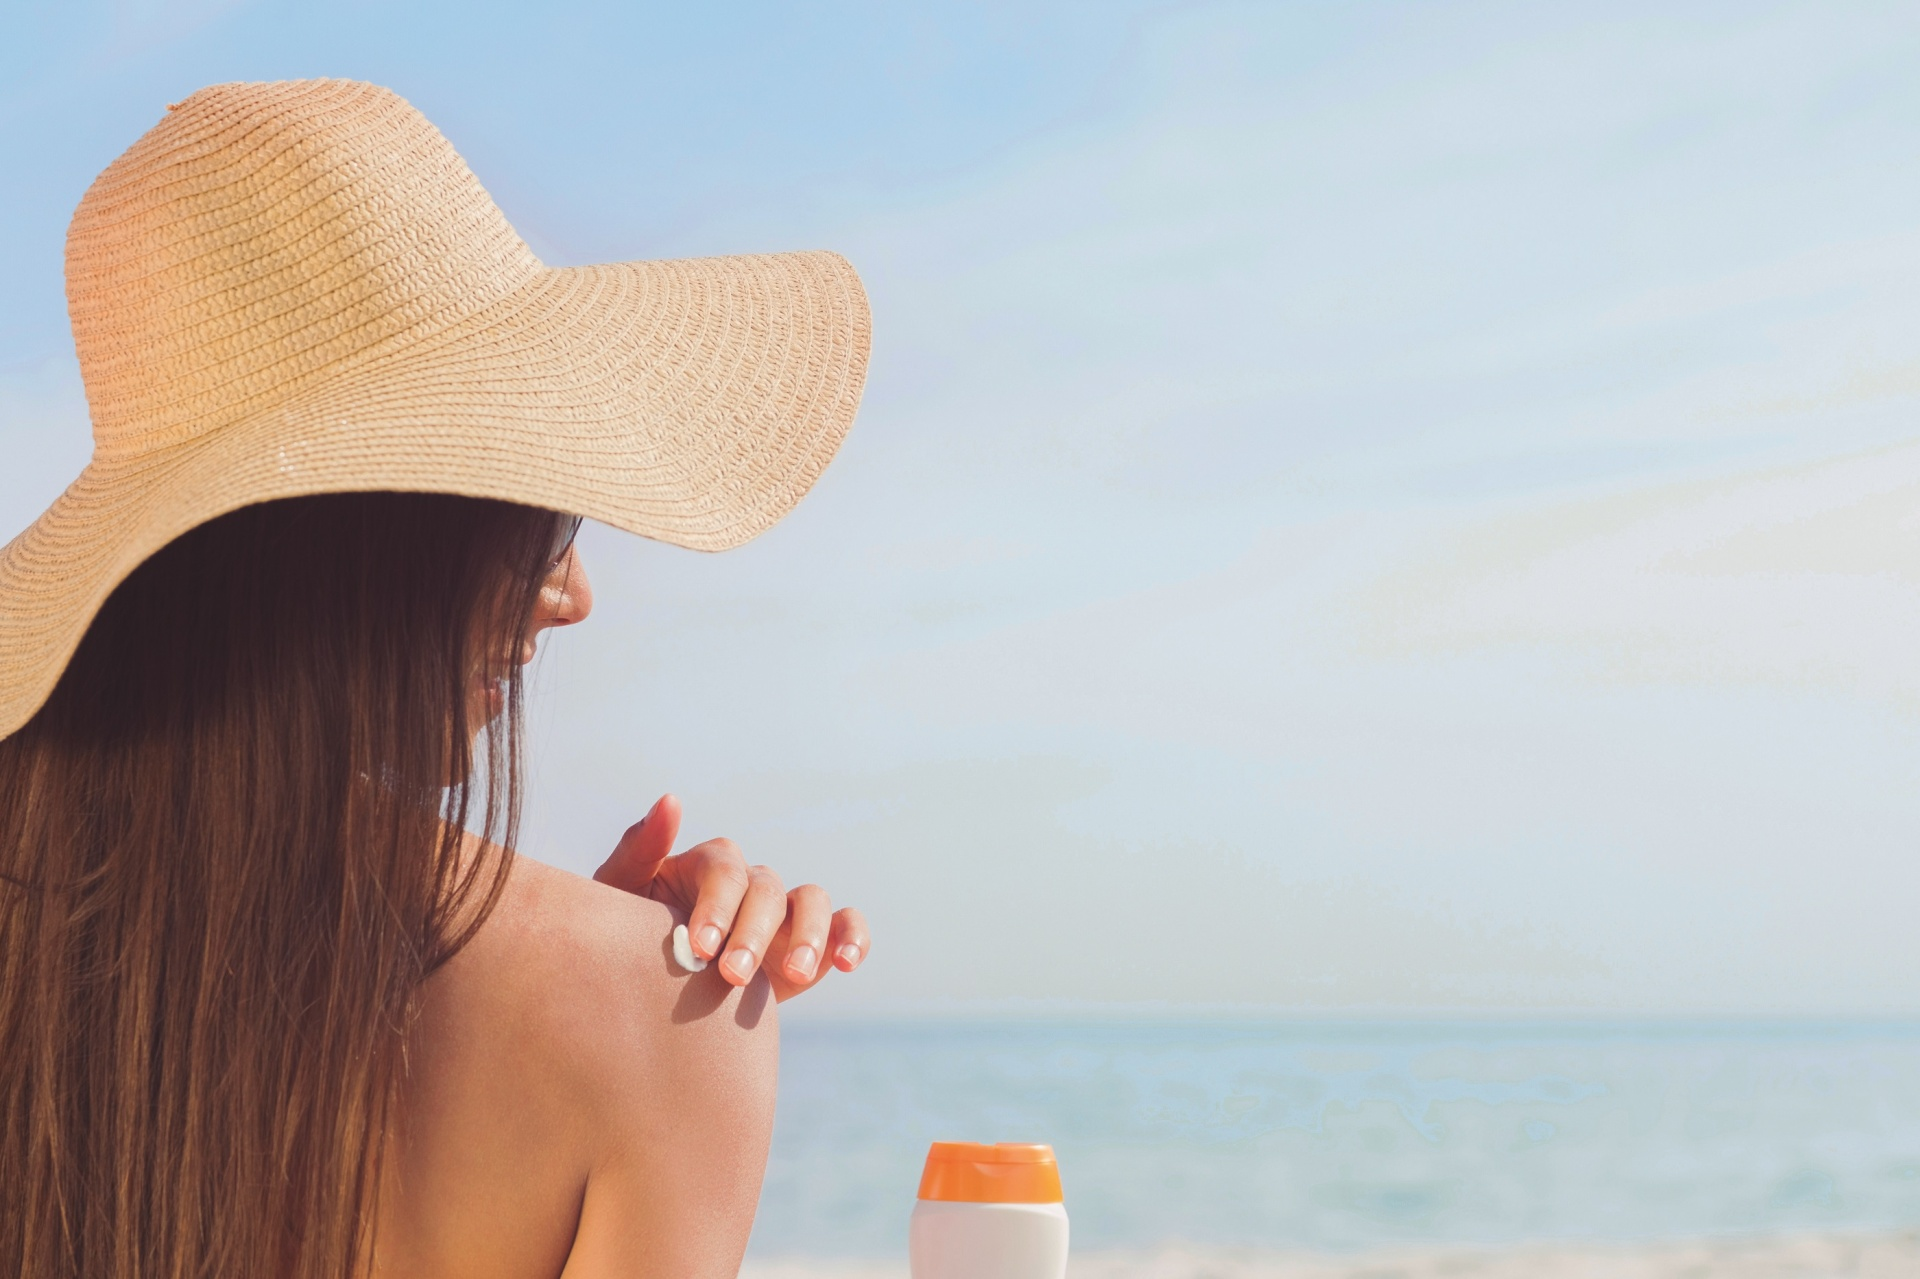 Le soleil et vitamine d